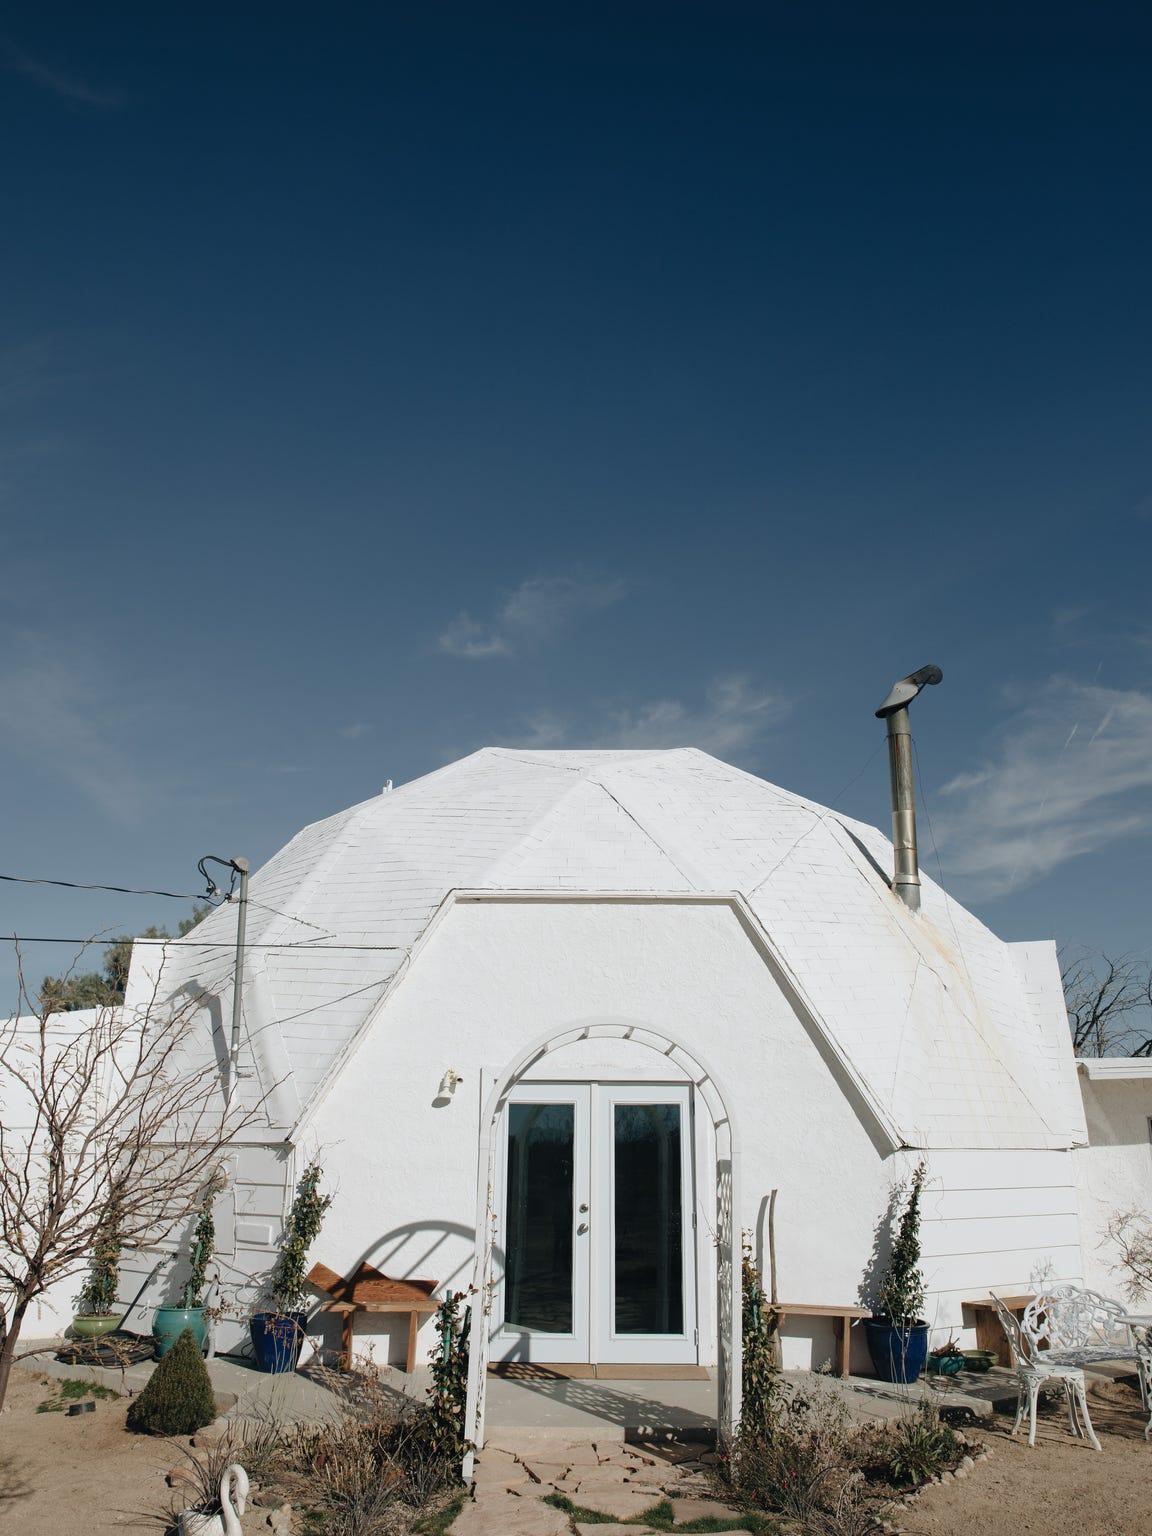 At her Zen Dome in Joshua Tree, artist Angel Chen is